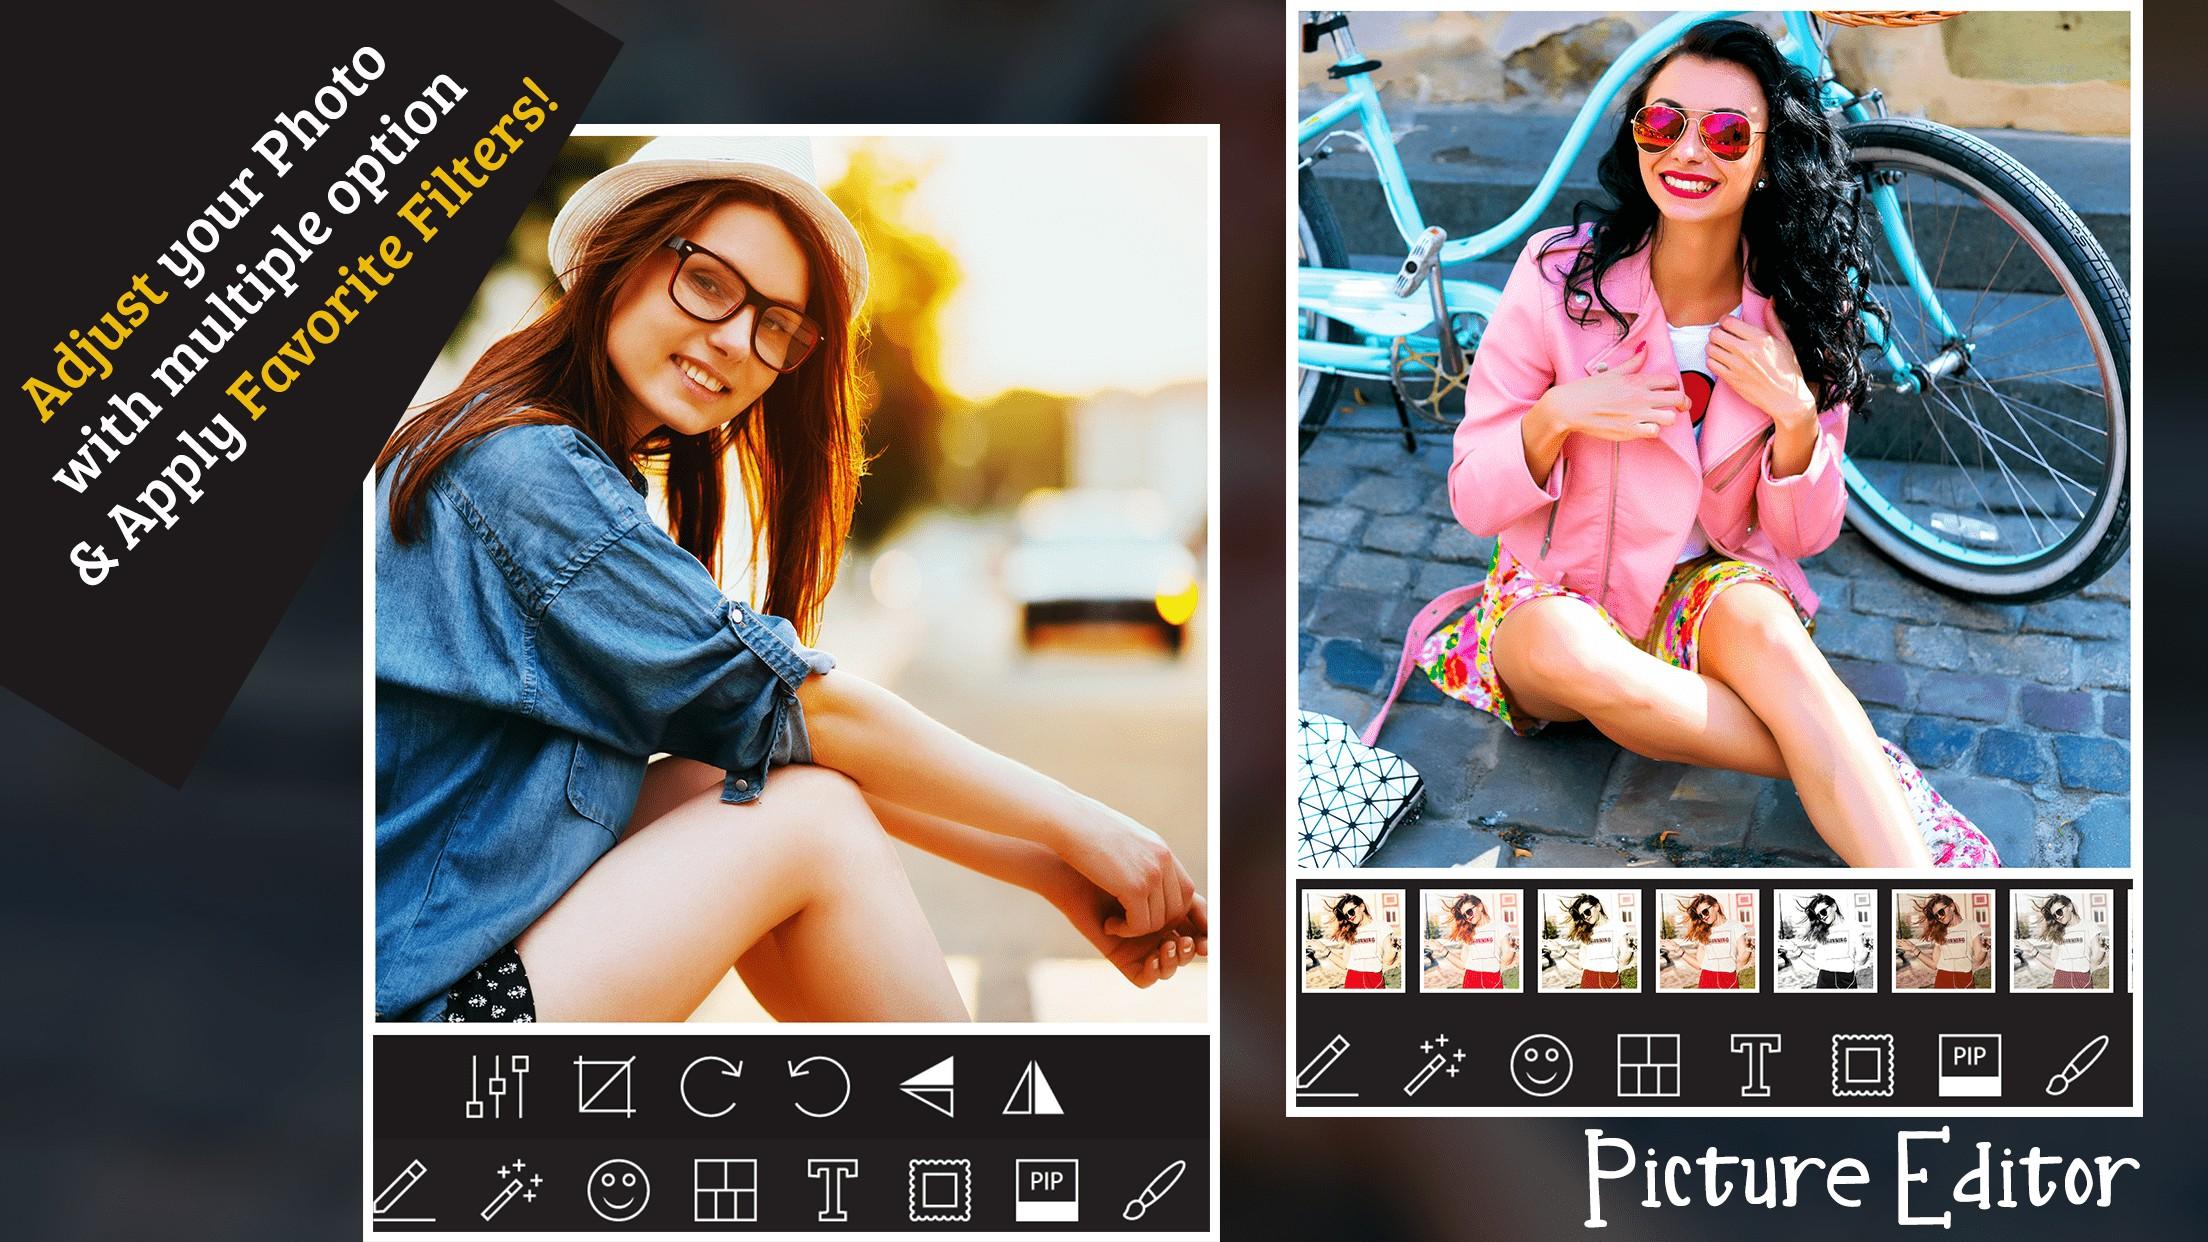 Pic Editor - Blur Collage Maker